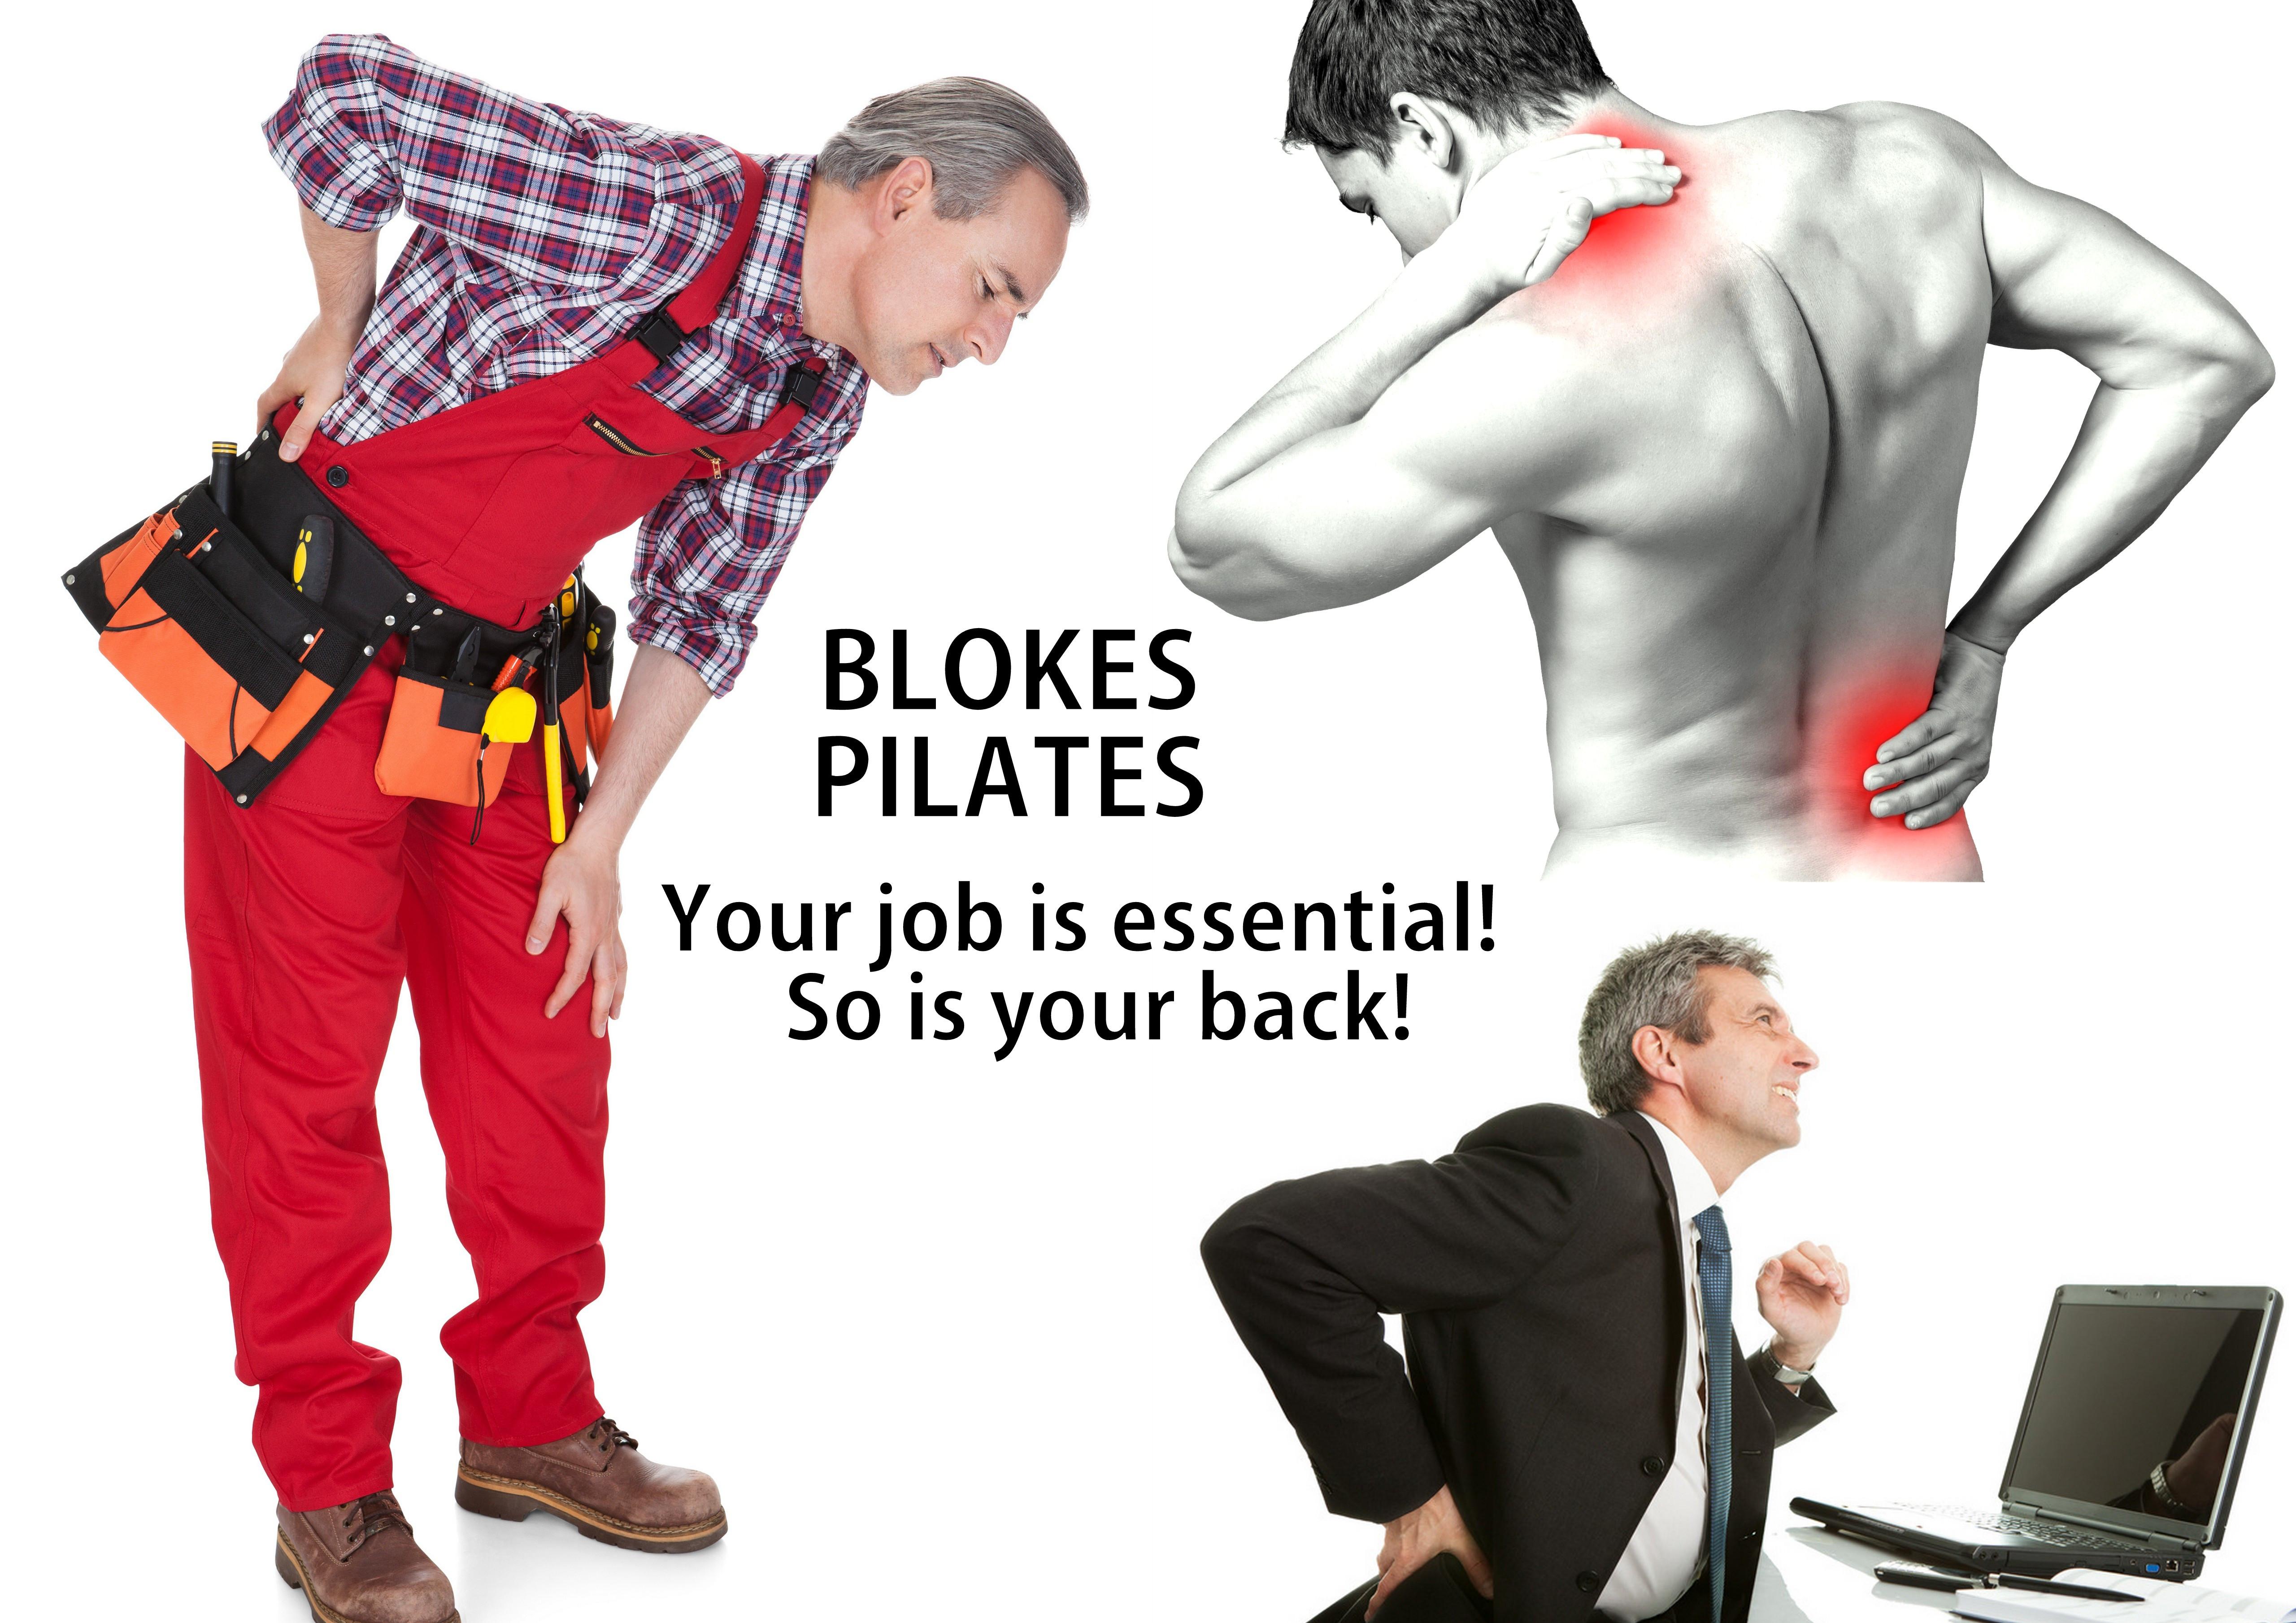 Blokes Pilates: Monday 20:30